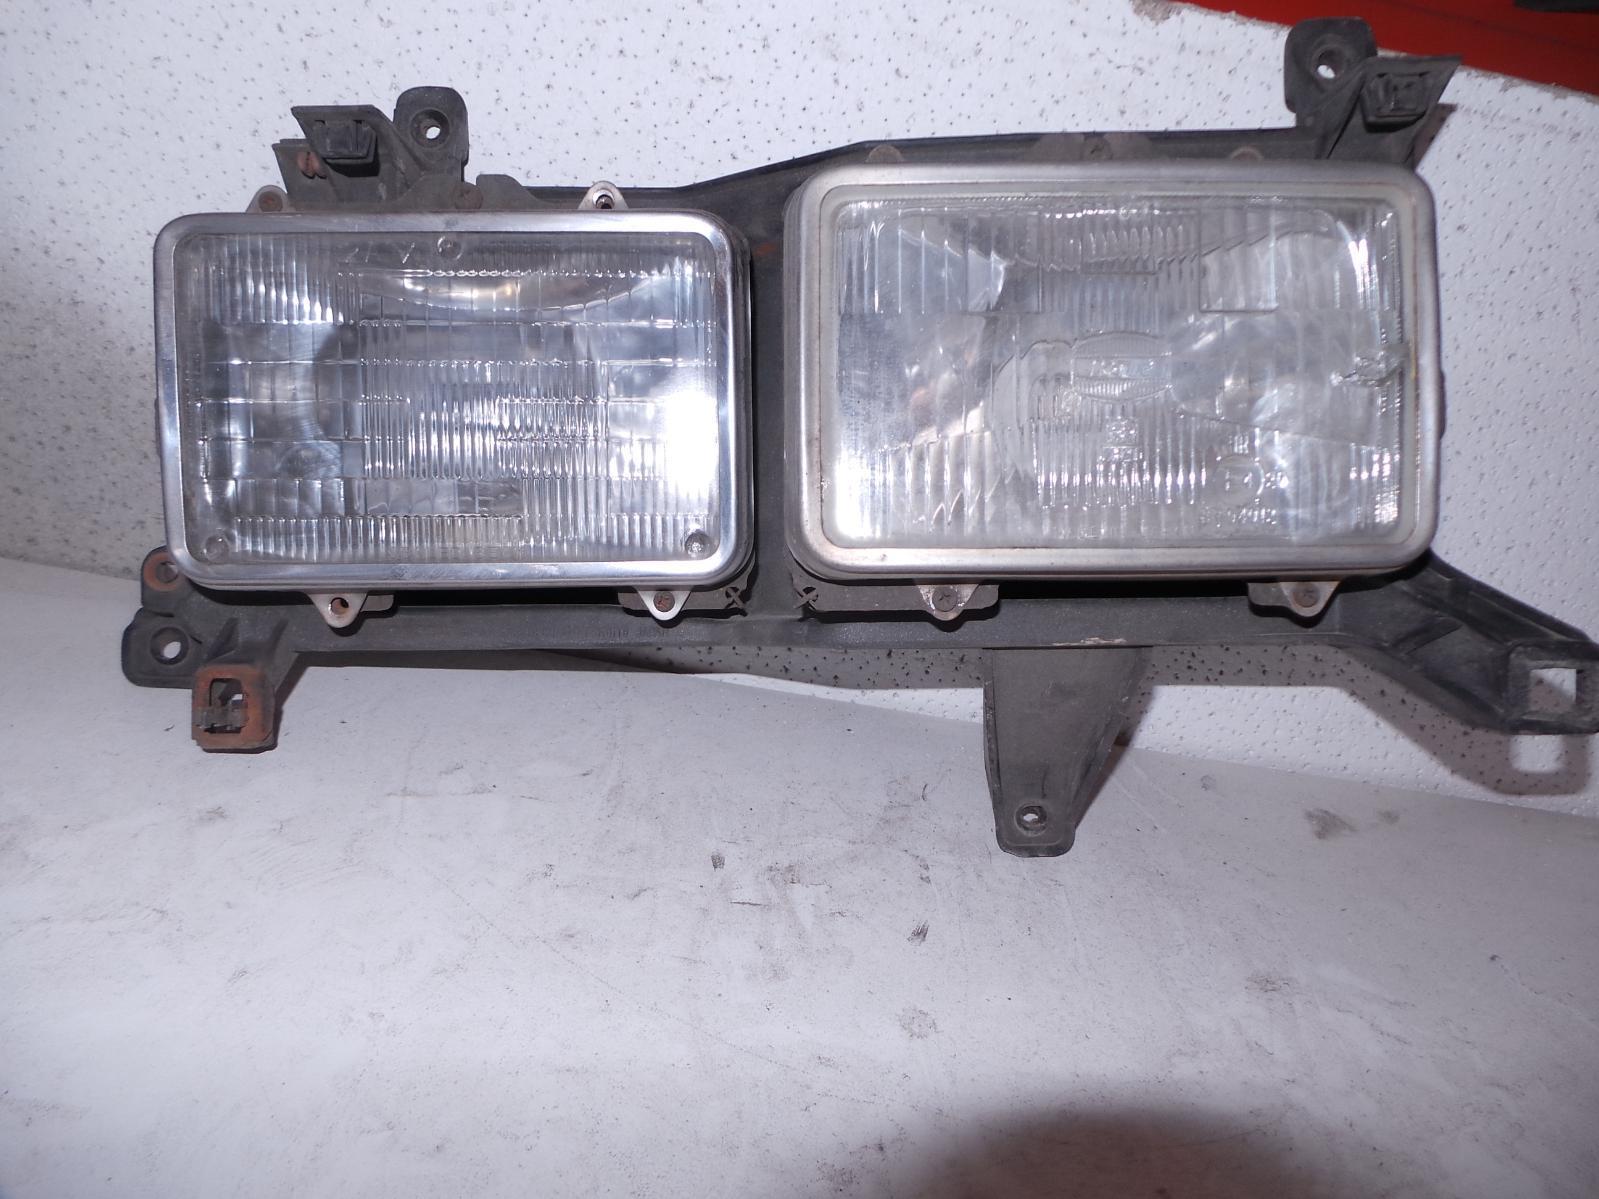 TOYOTA LANDCRUISER, Right Headlamp, 80 SERIES, GX/GXL, TWIN SQUARE, 05/90-03/98